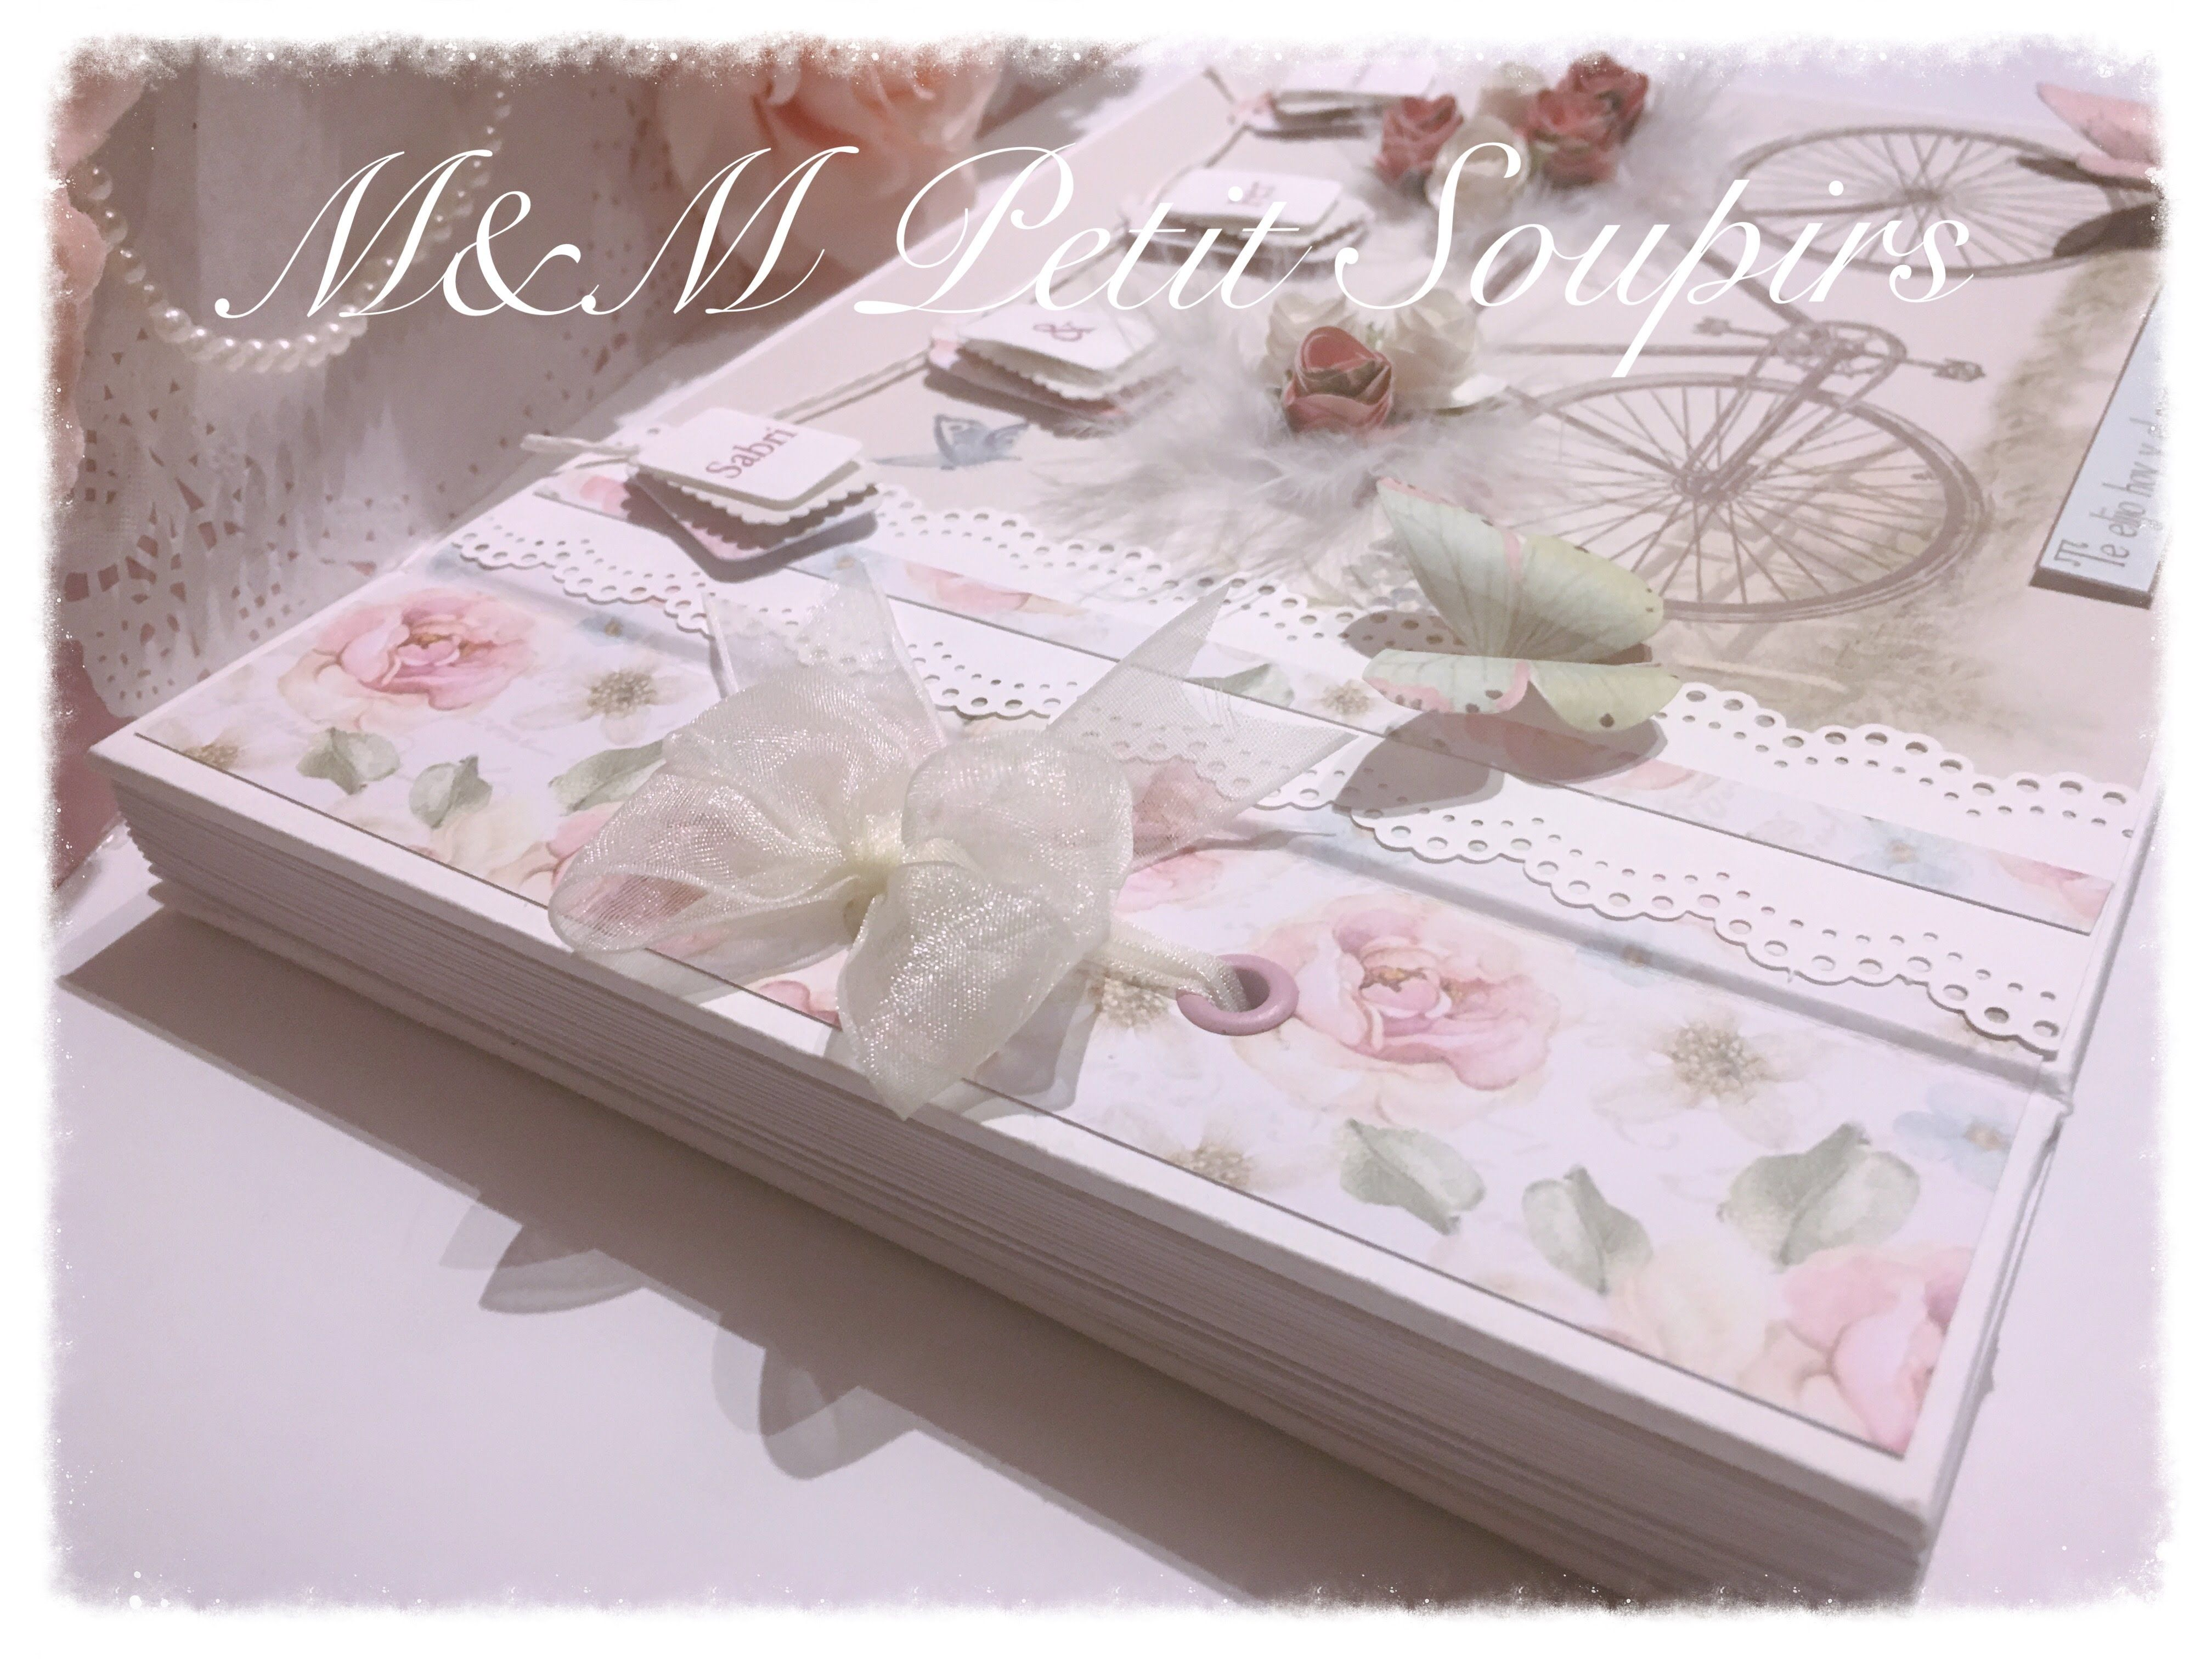 Scrapbook ideas using ribbon - Wedding Guest Book With Ribbon Binding Diy Tutorial Scrap Scrapbook Scrapbooking For All My Scraperas Princesses Step By Step